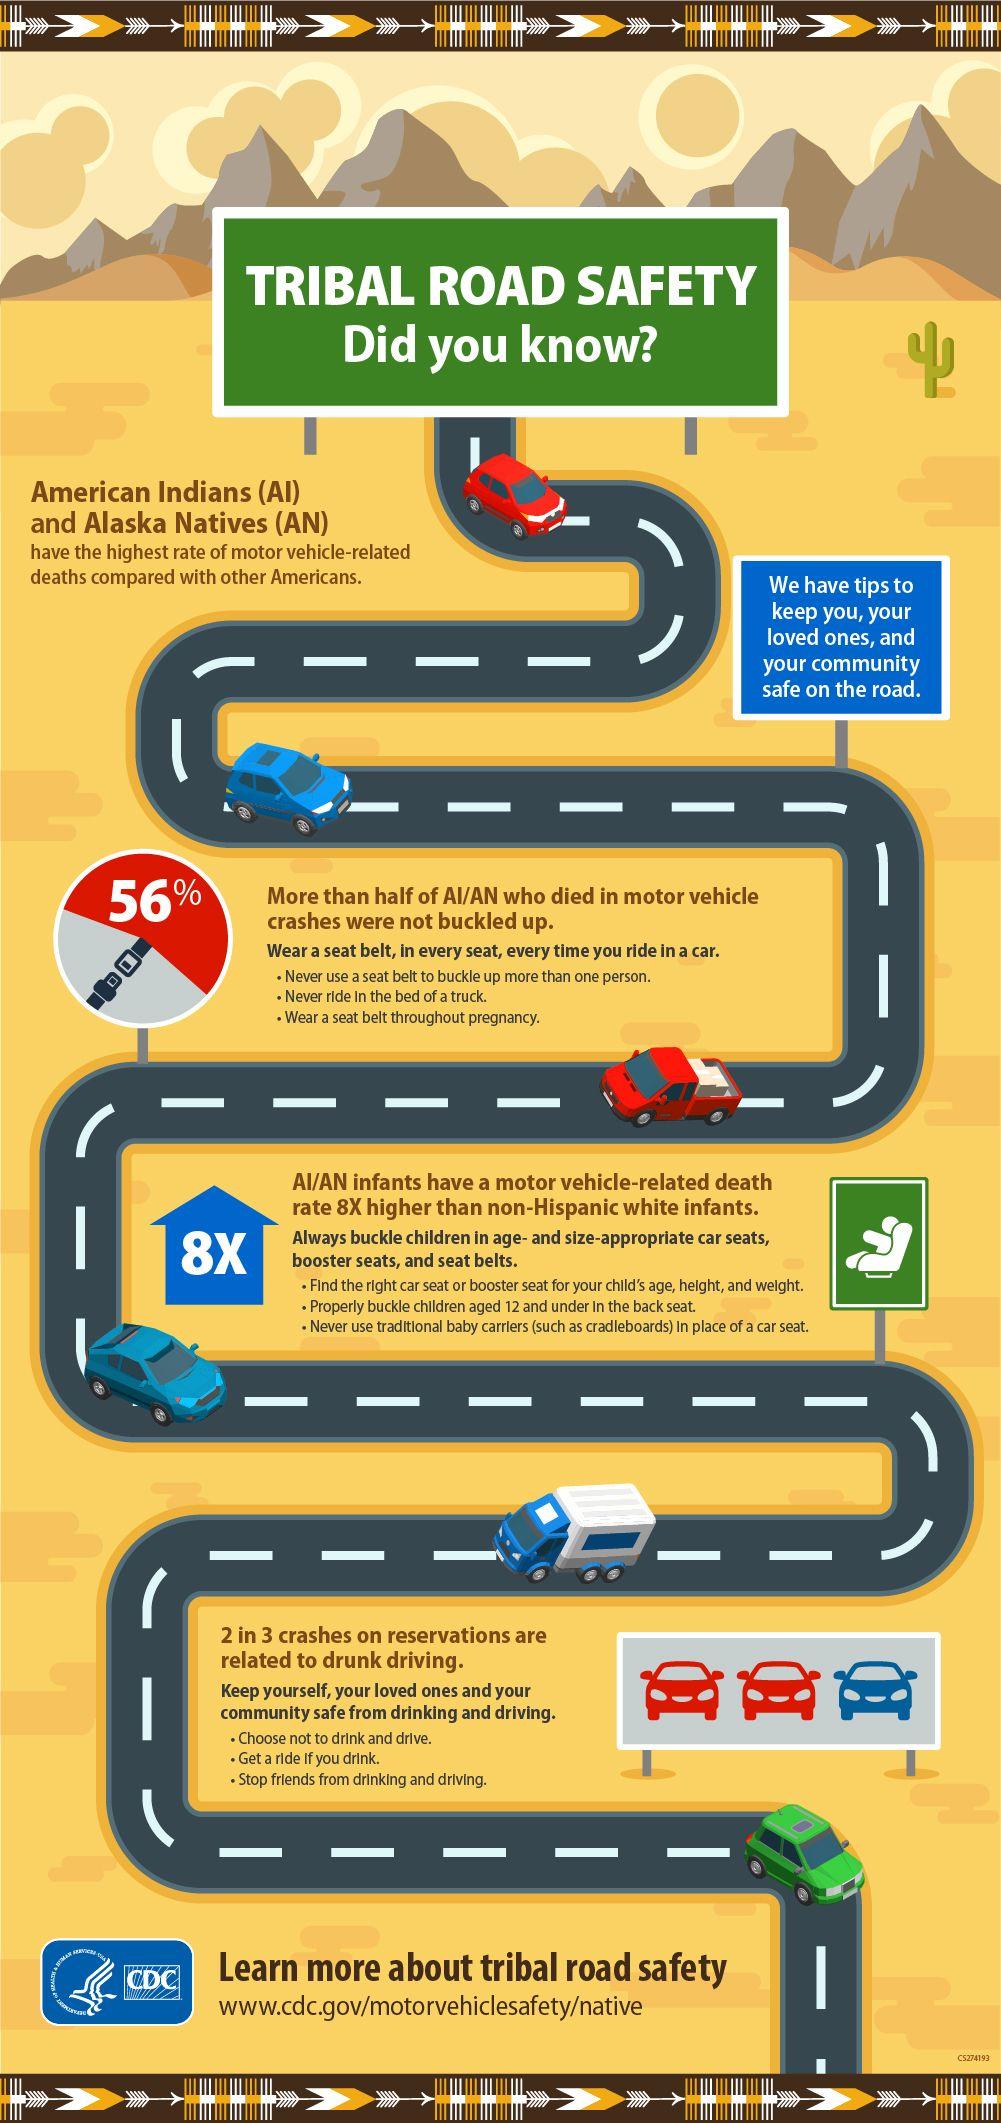 Terrific Safercar Gov The Right Car Seat Ideas - Cars Image Engine ...